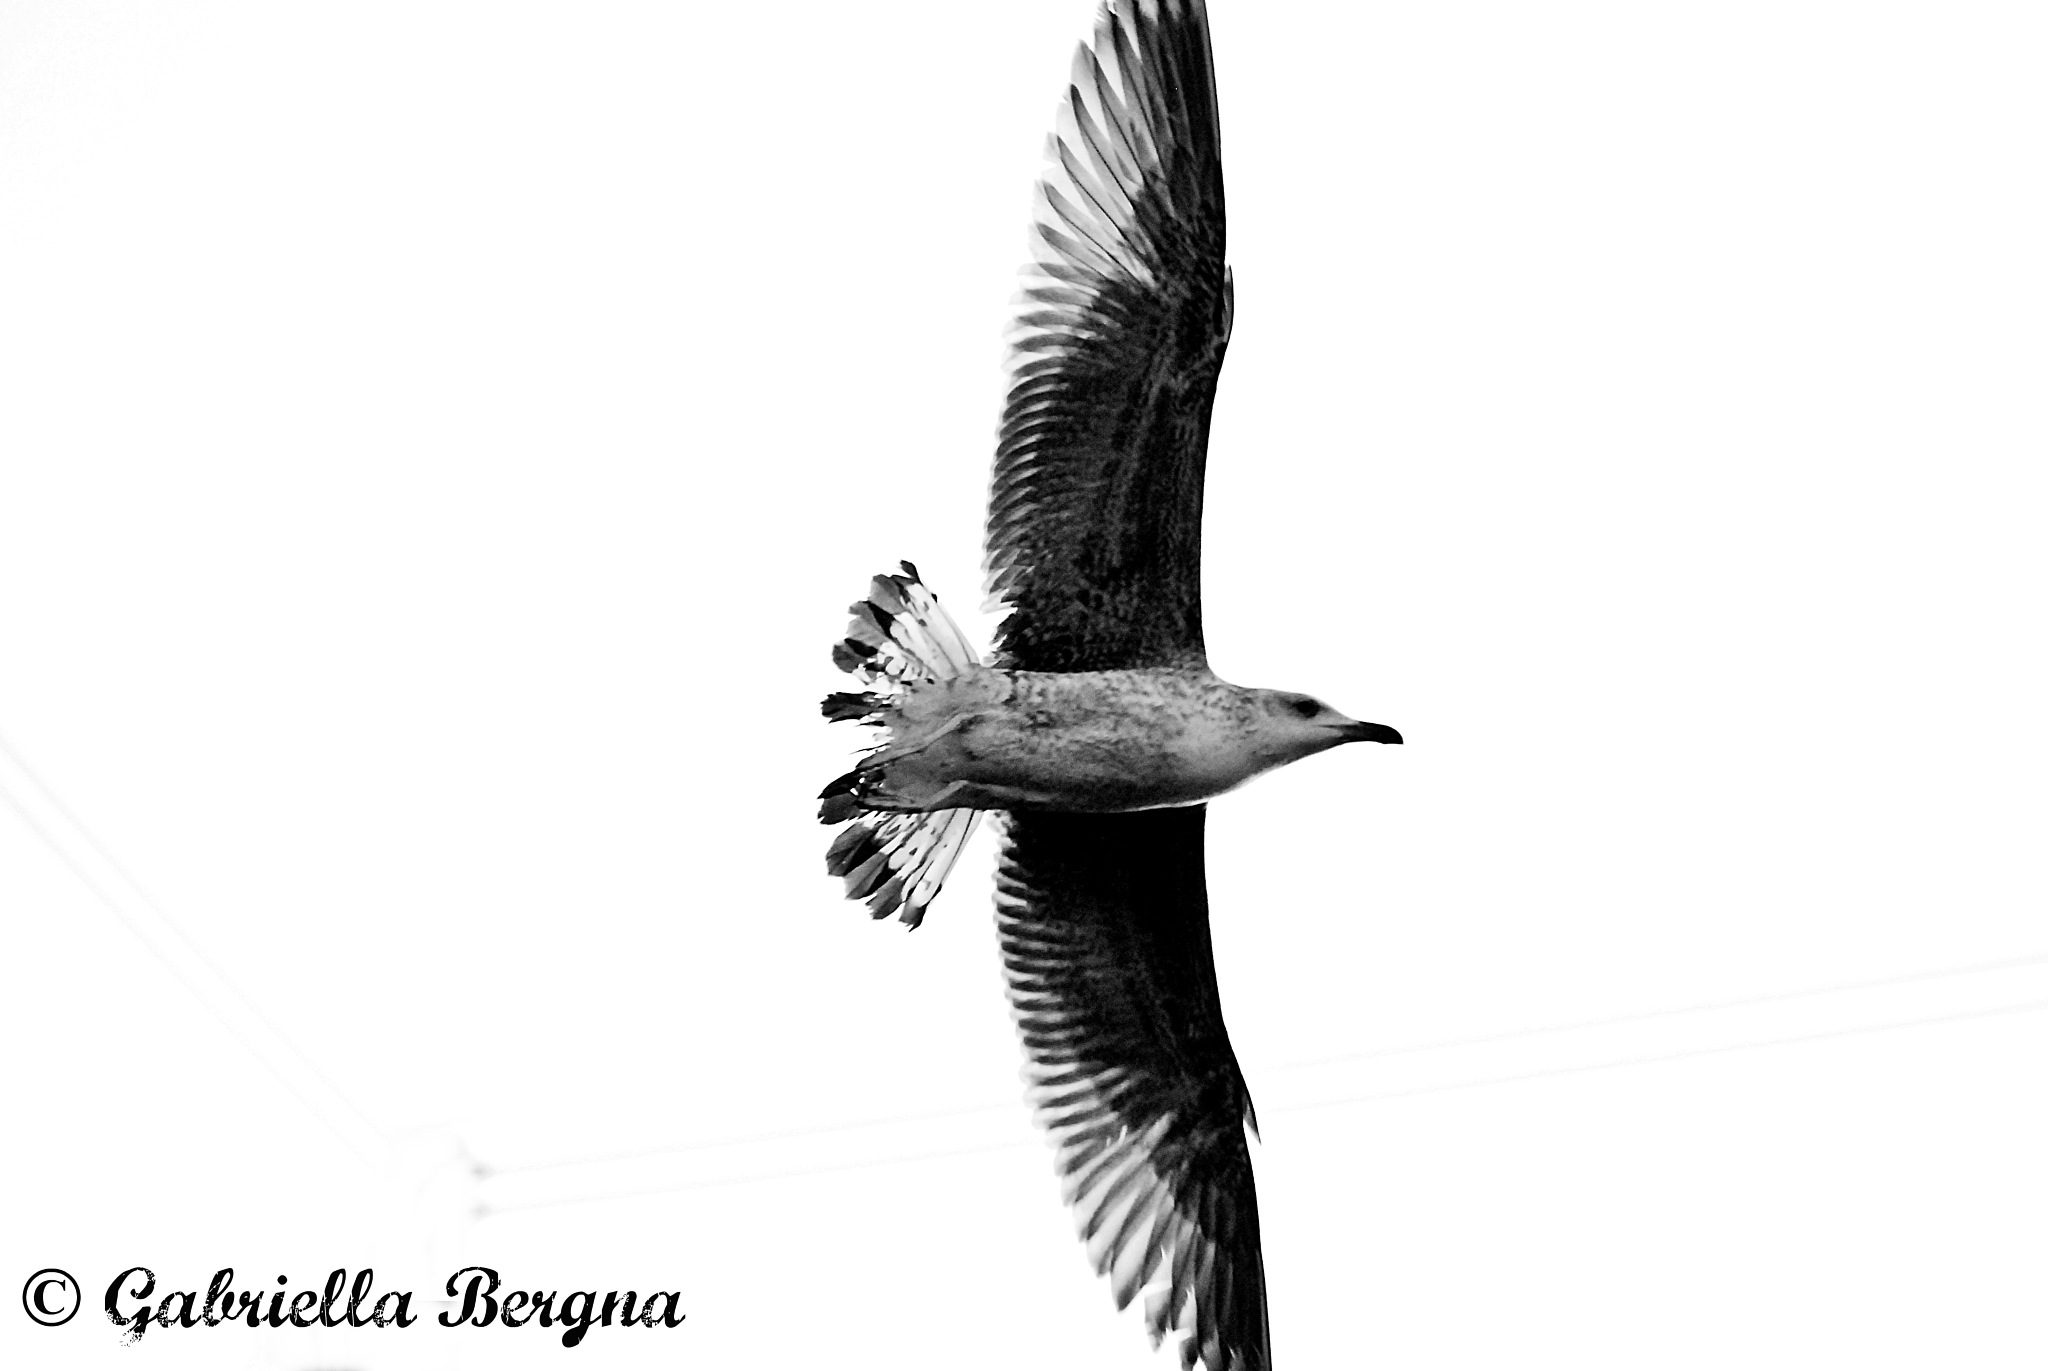 seagull by Gabriella Bergna